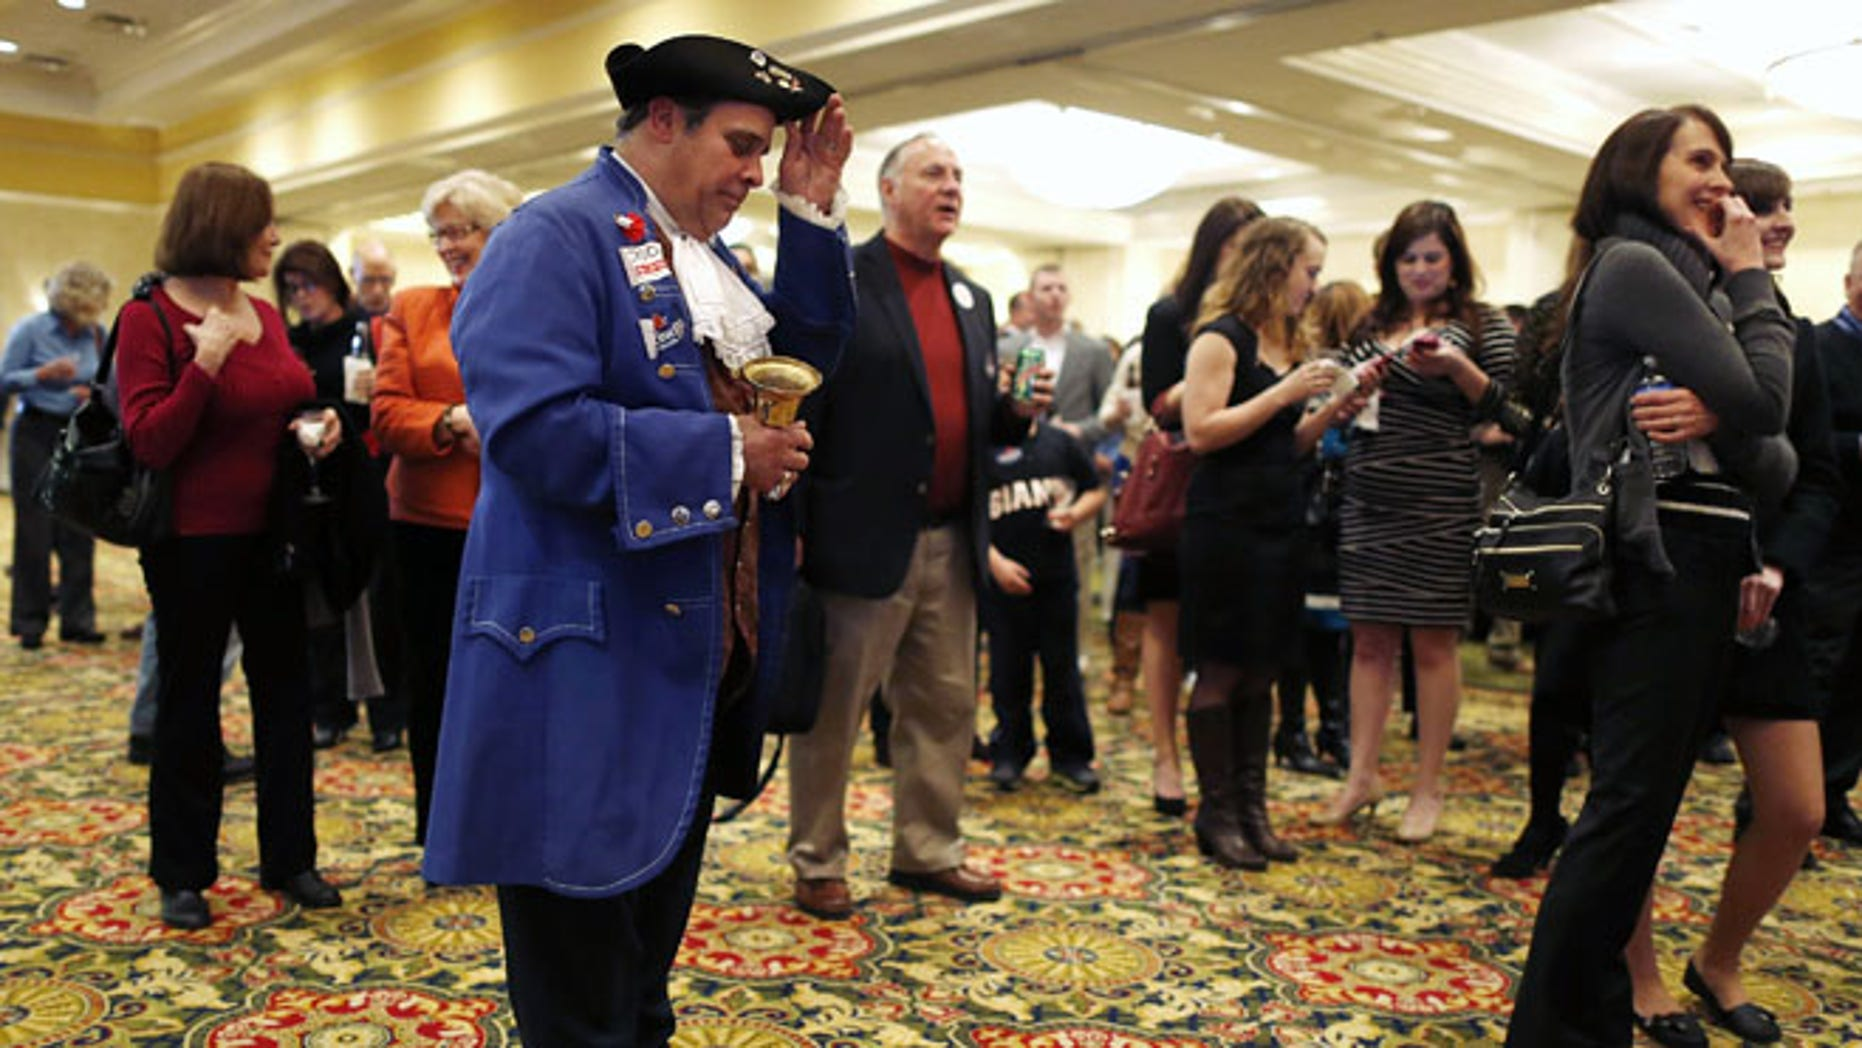 FILE: Nov. 5, 2013: A Tea Party member at a GOP event in Richmond, Va.